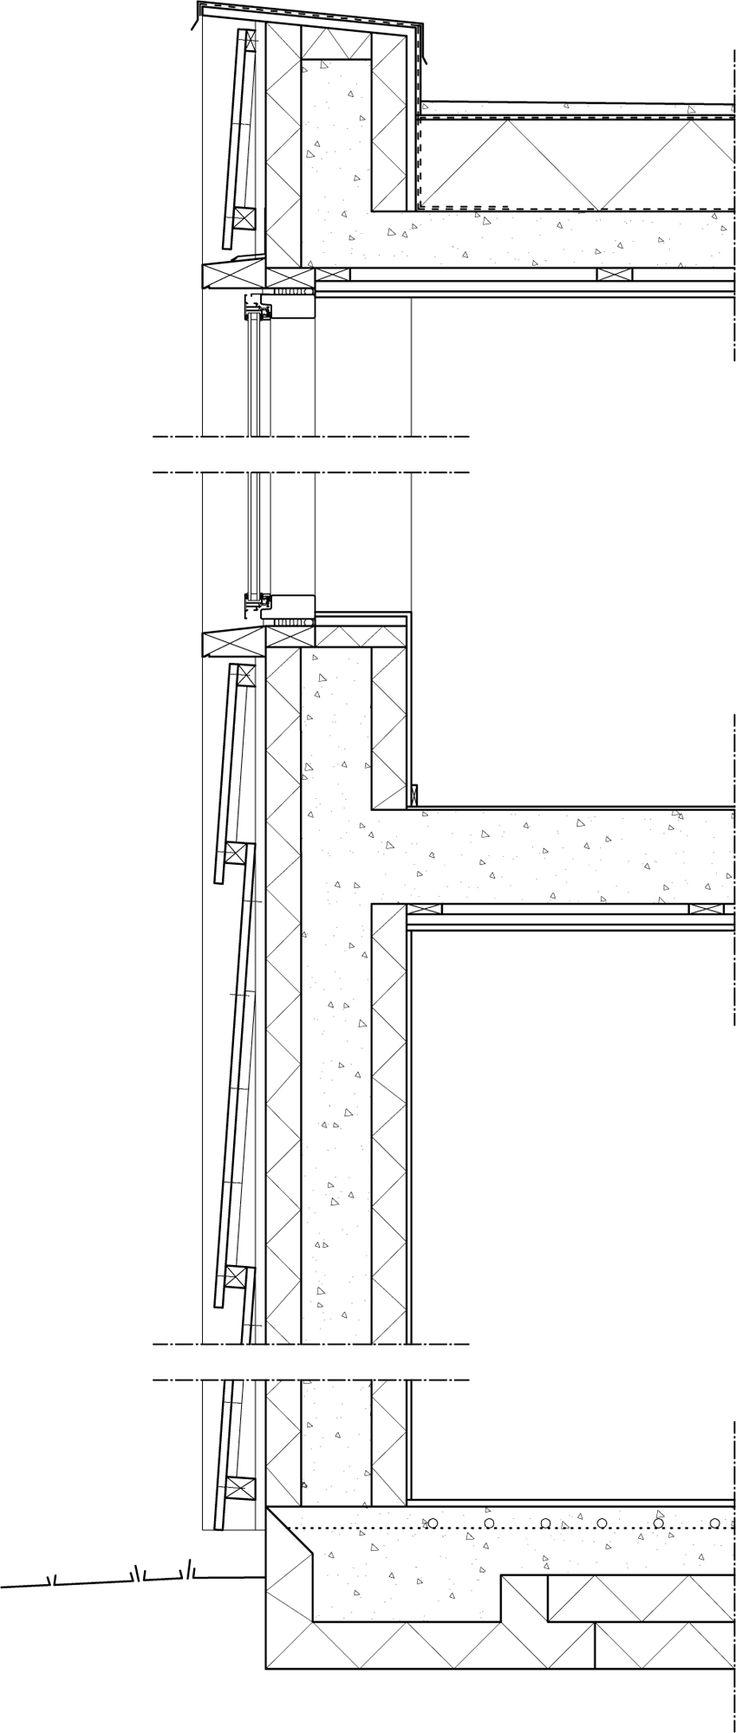 House K / Tham & Videgård Hansson Arkitekter with rain screen exterior and insulation/form concrete foundation.